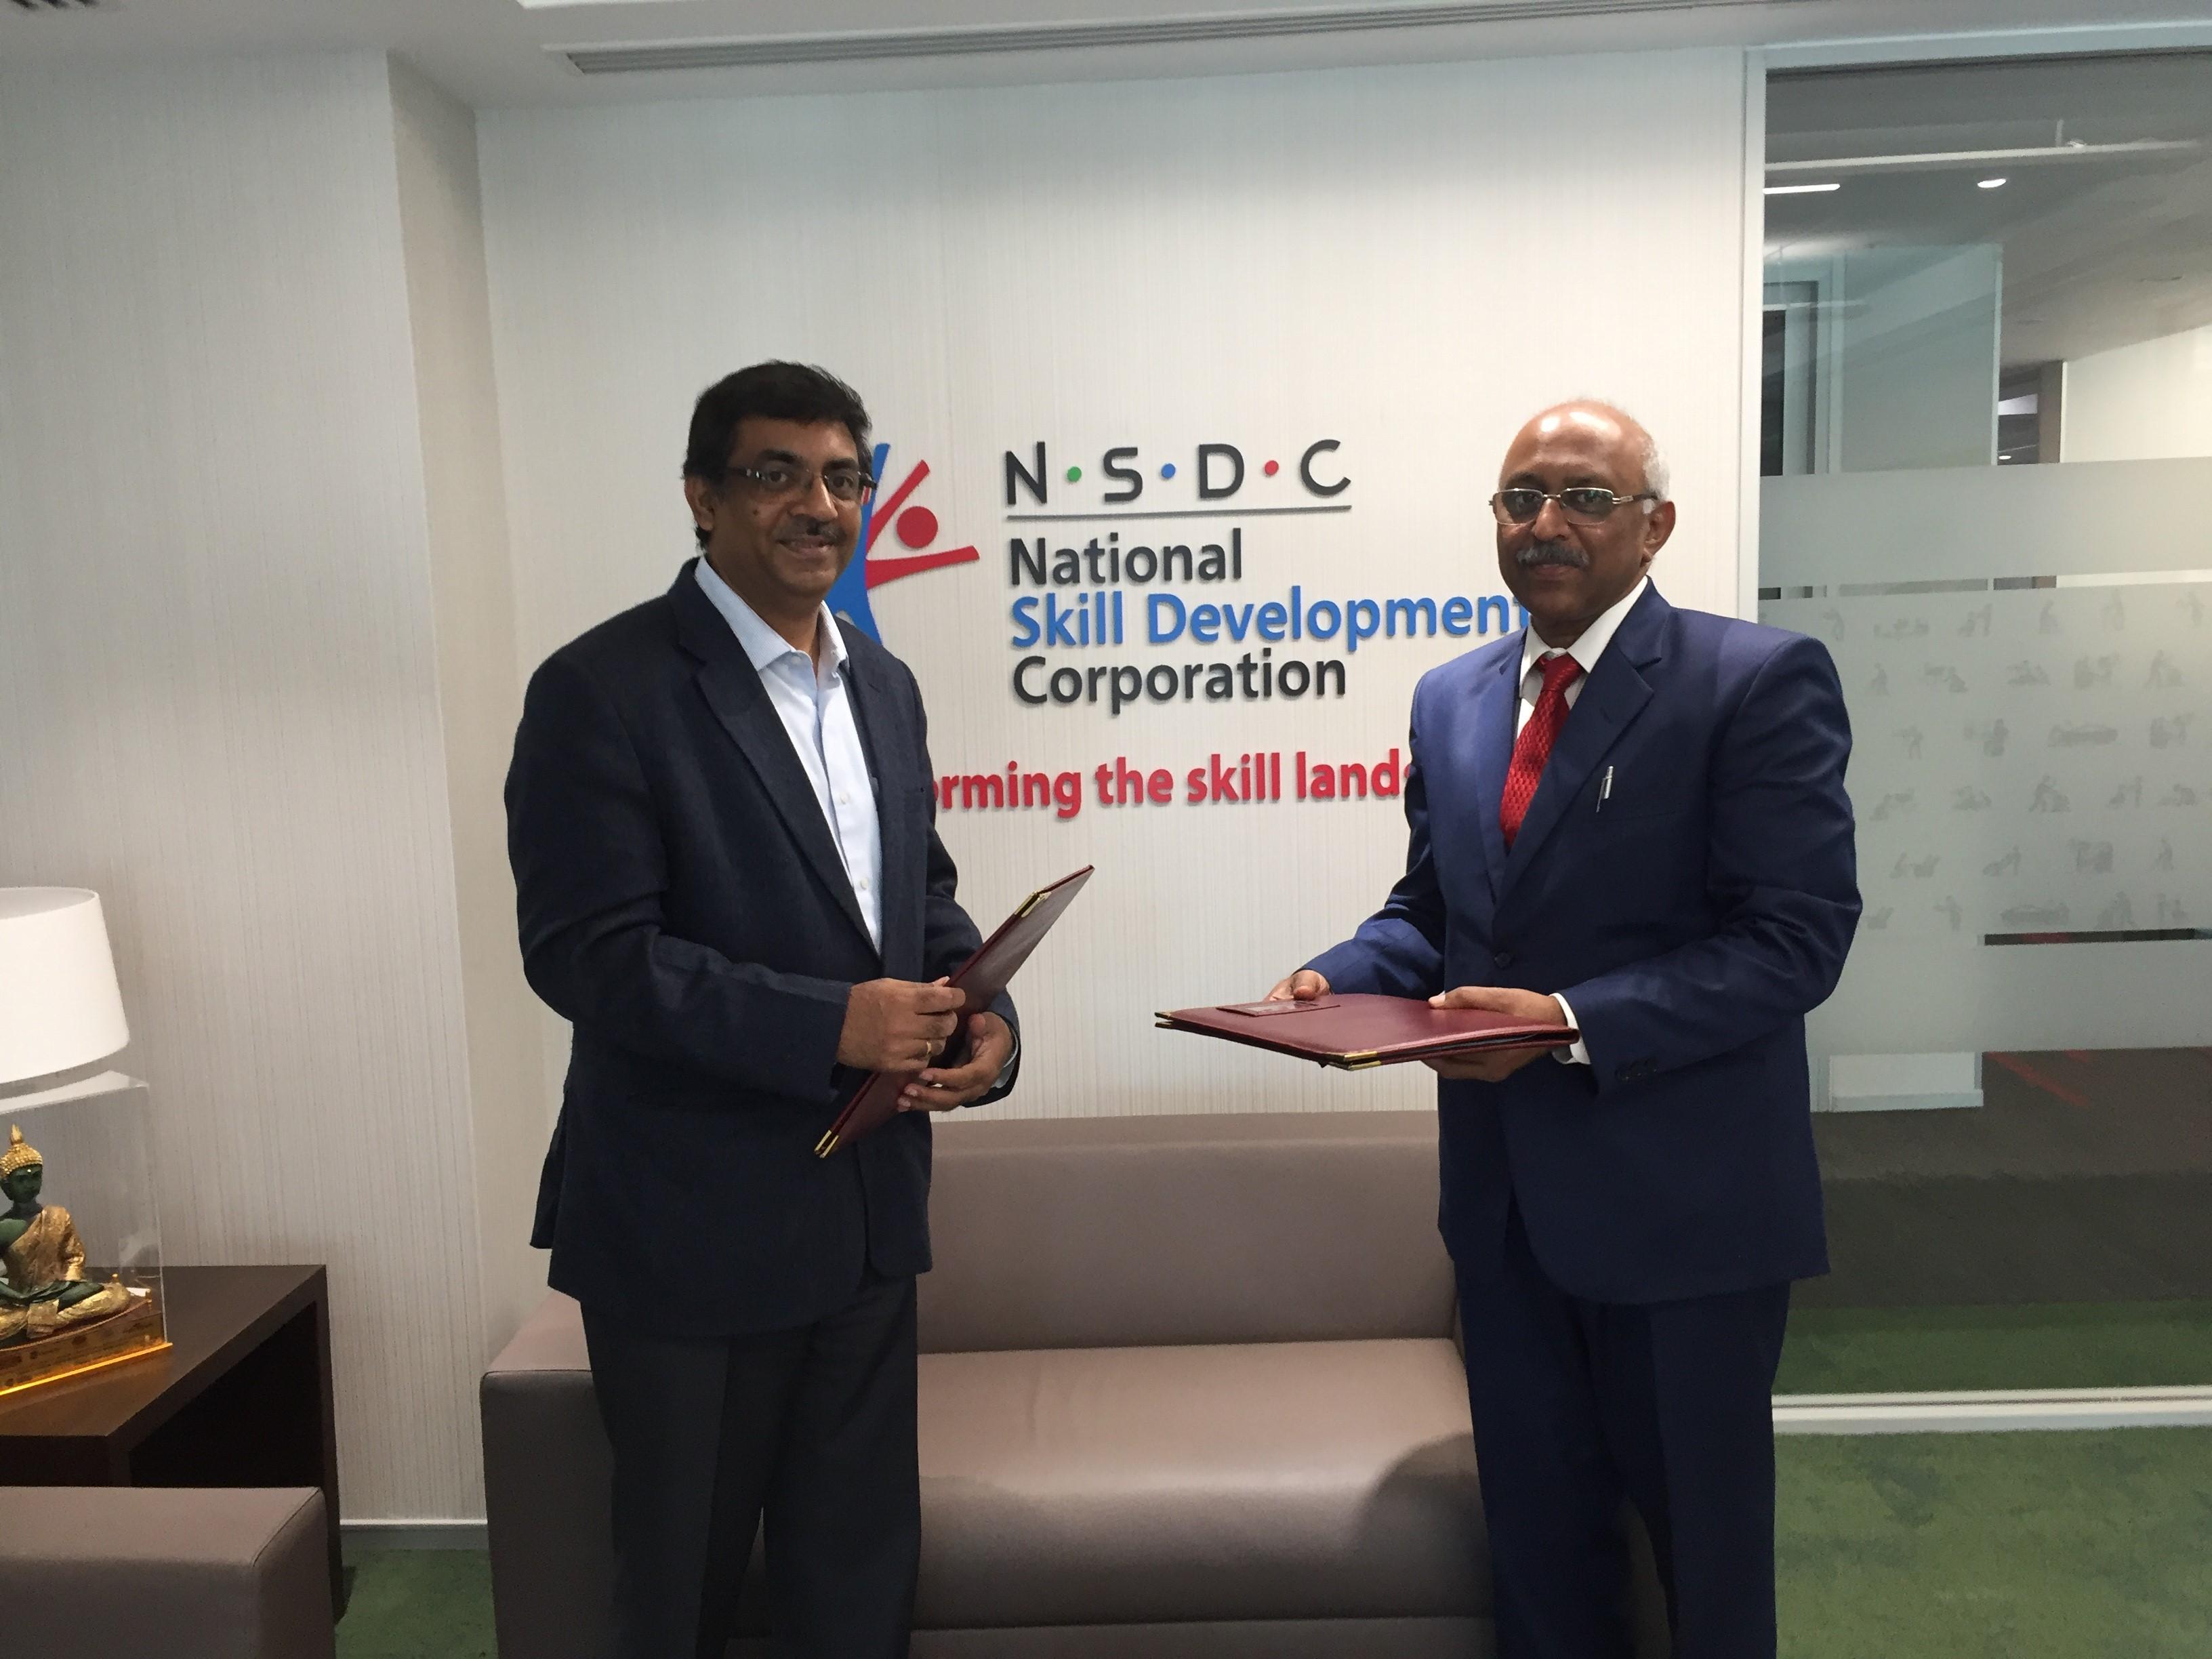 nsdc-piocci-partnership